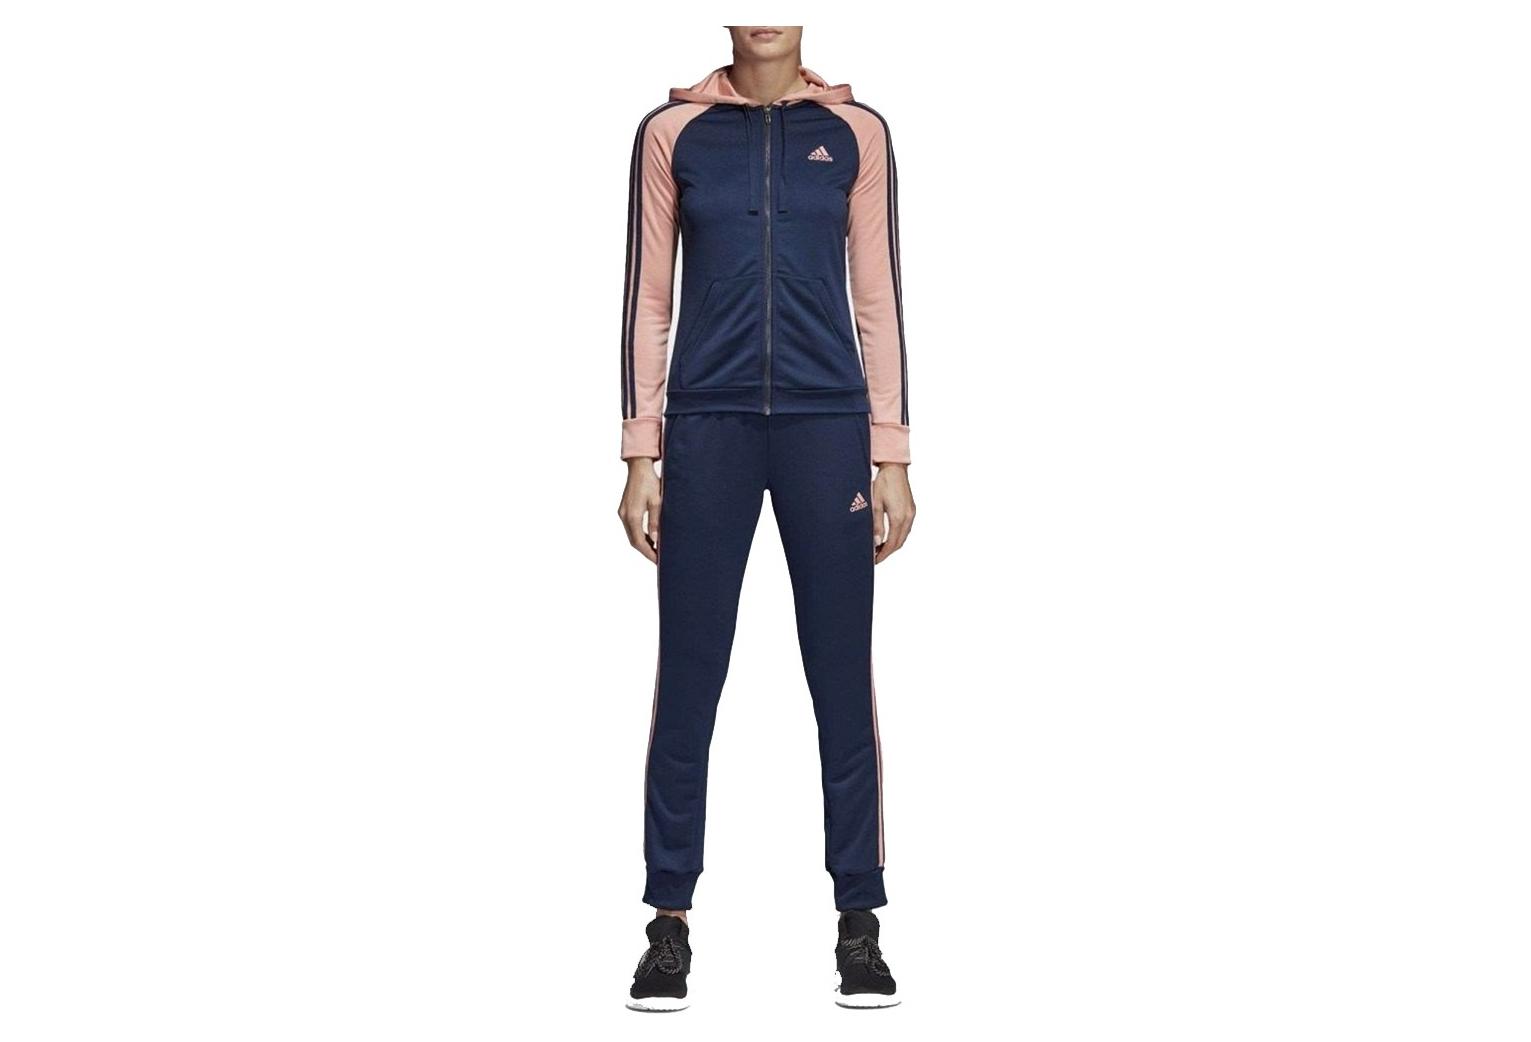 Survêtement bleu marine femme Adidas ReFocus